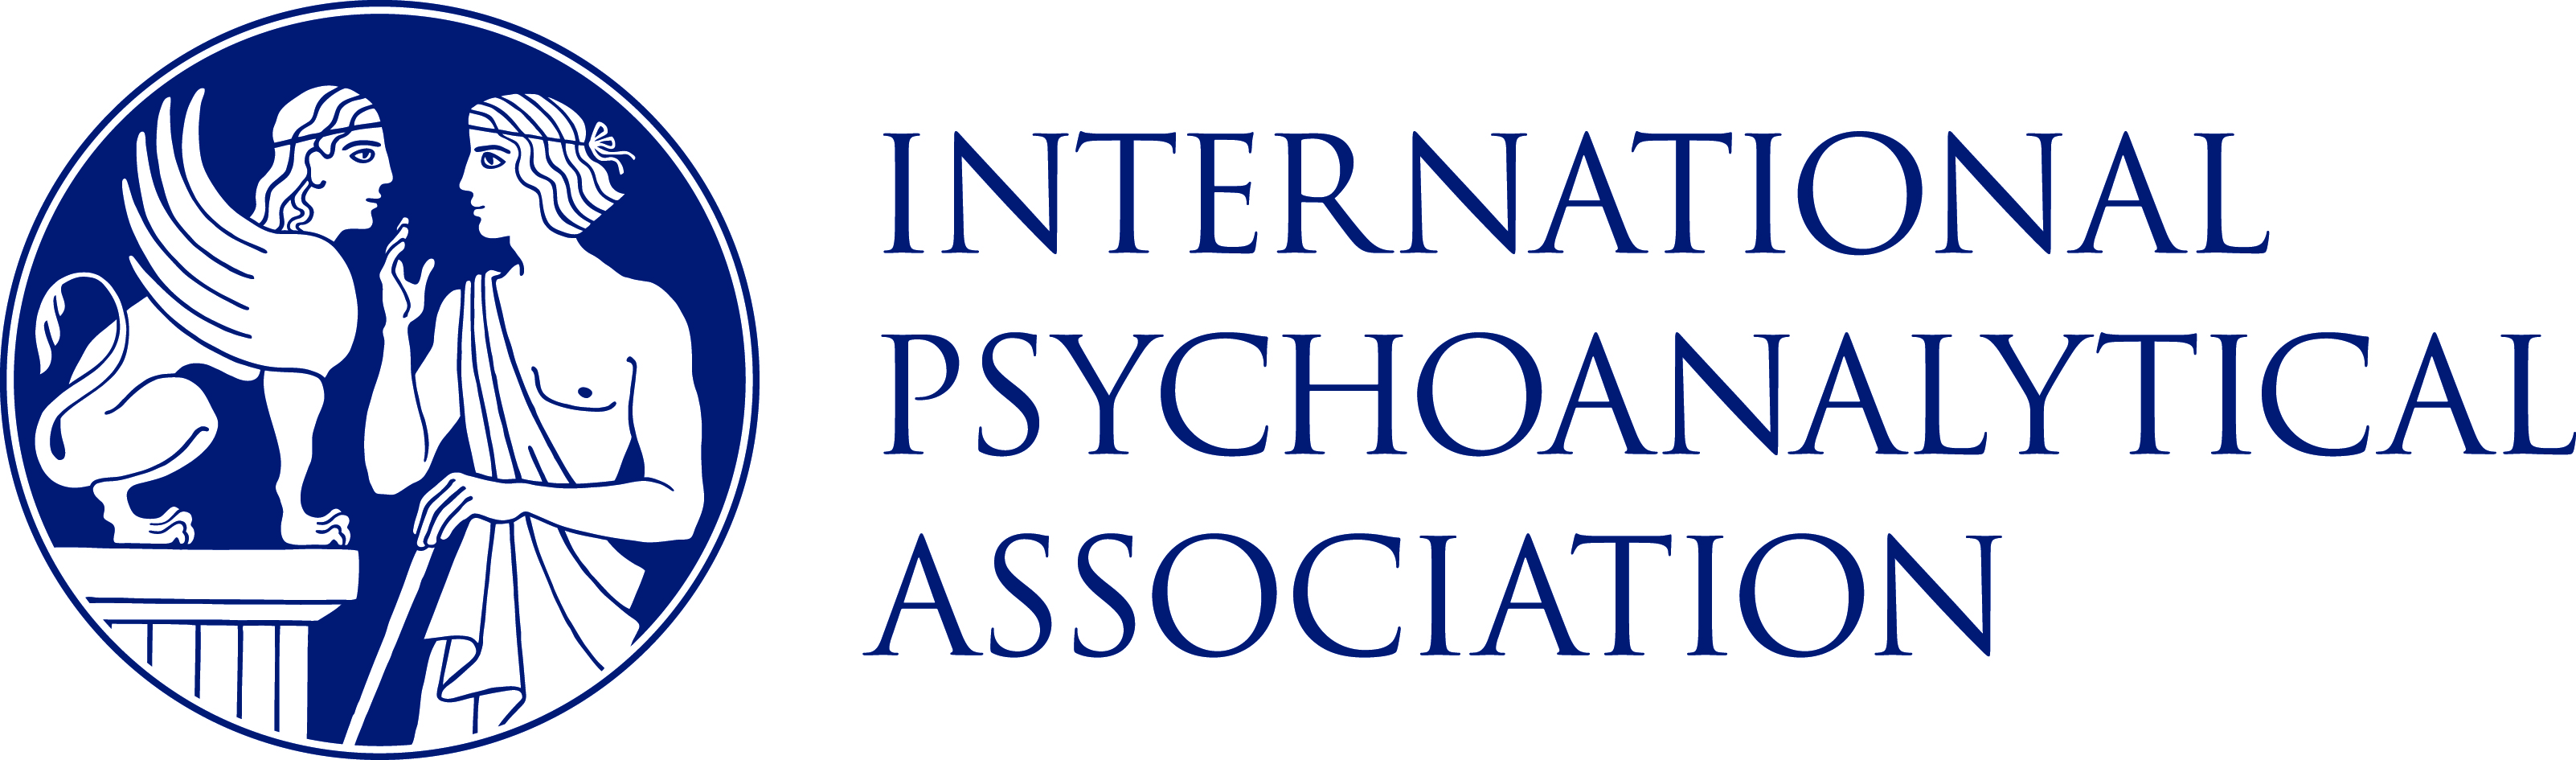 International Psychoanalytical Association